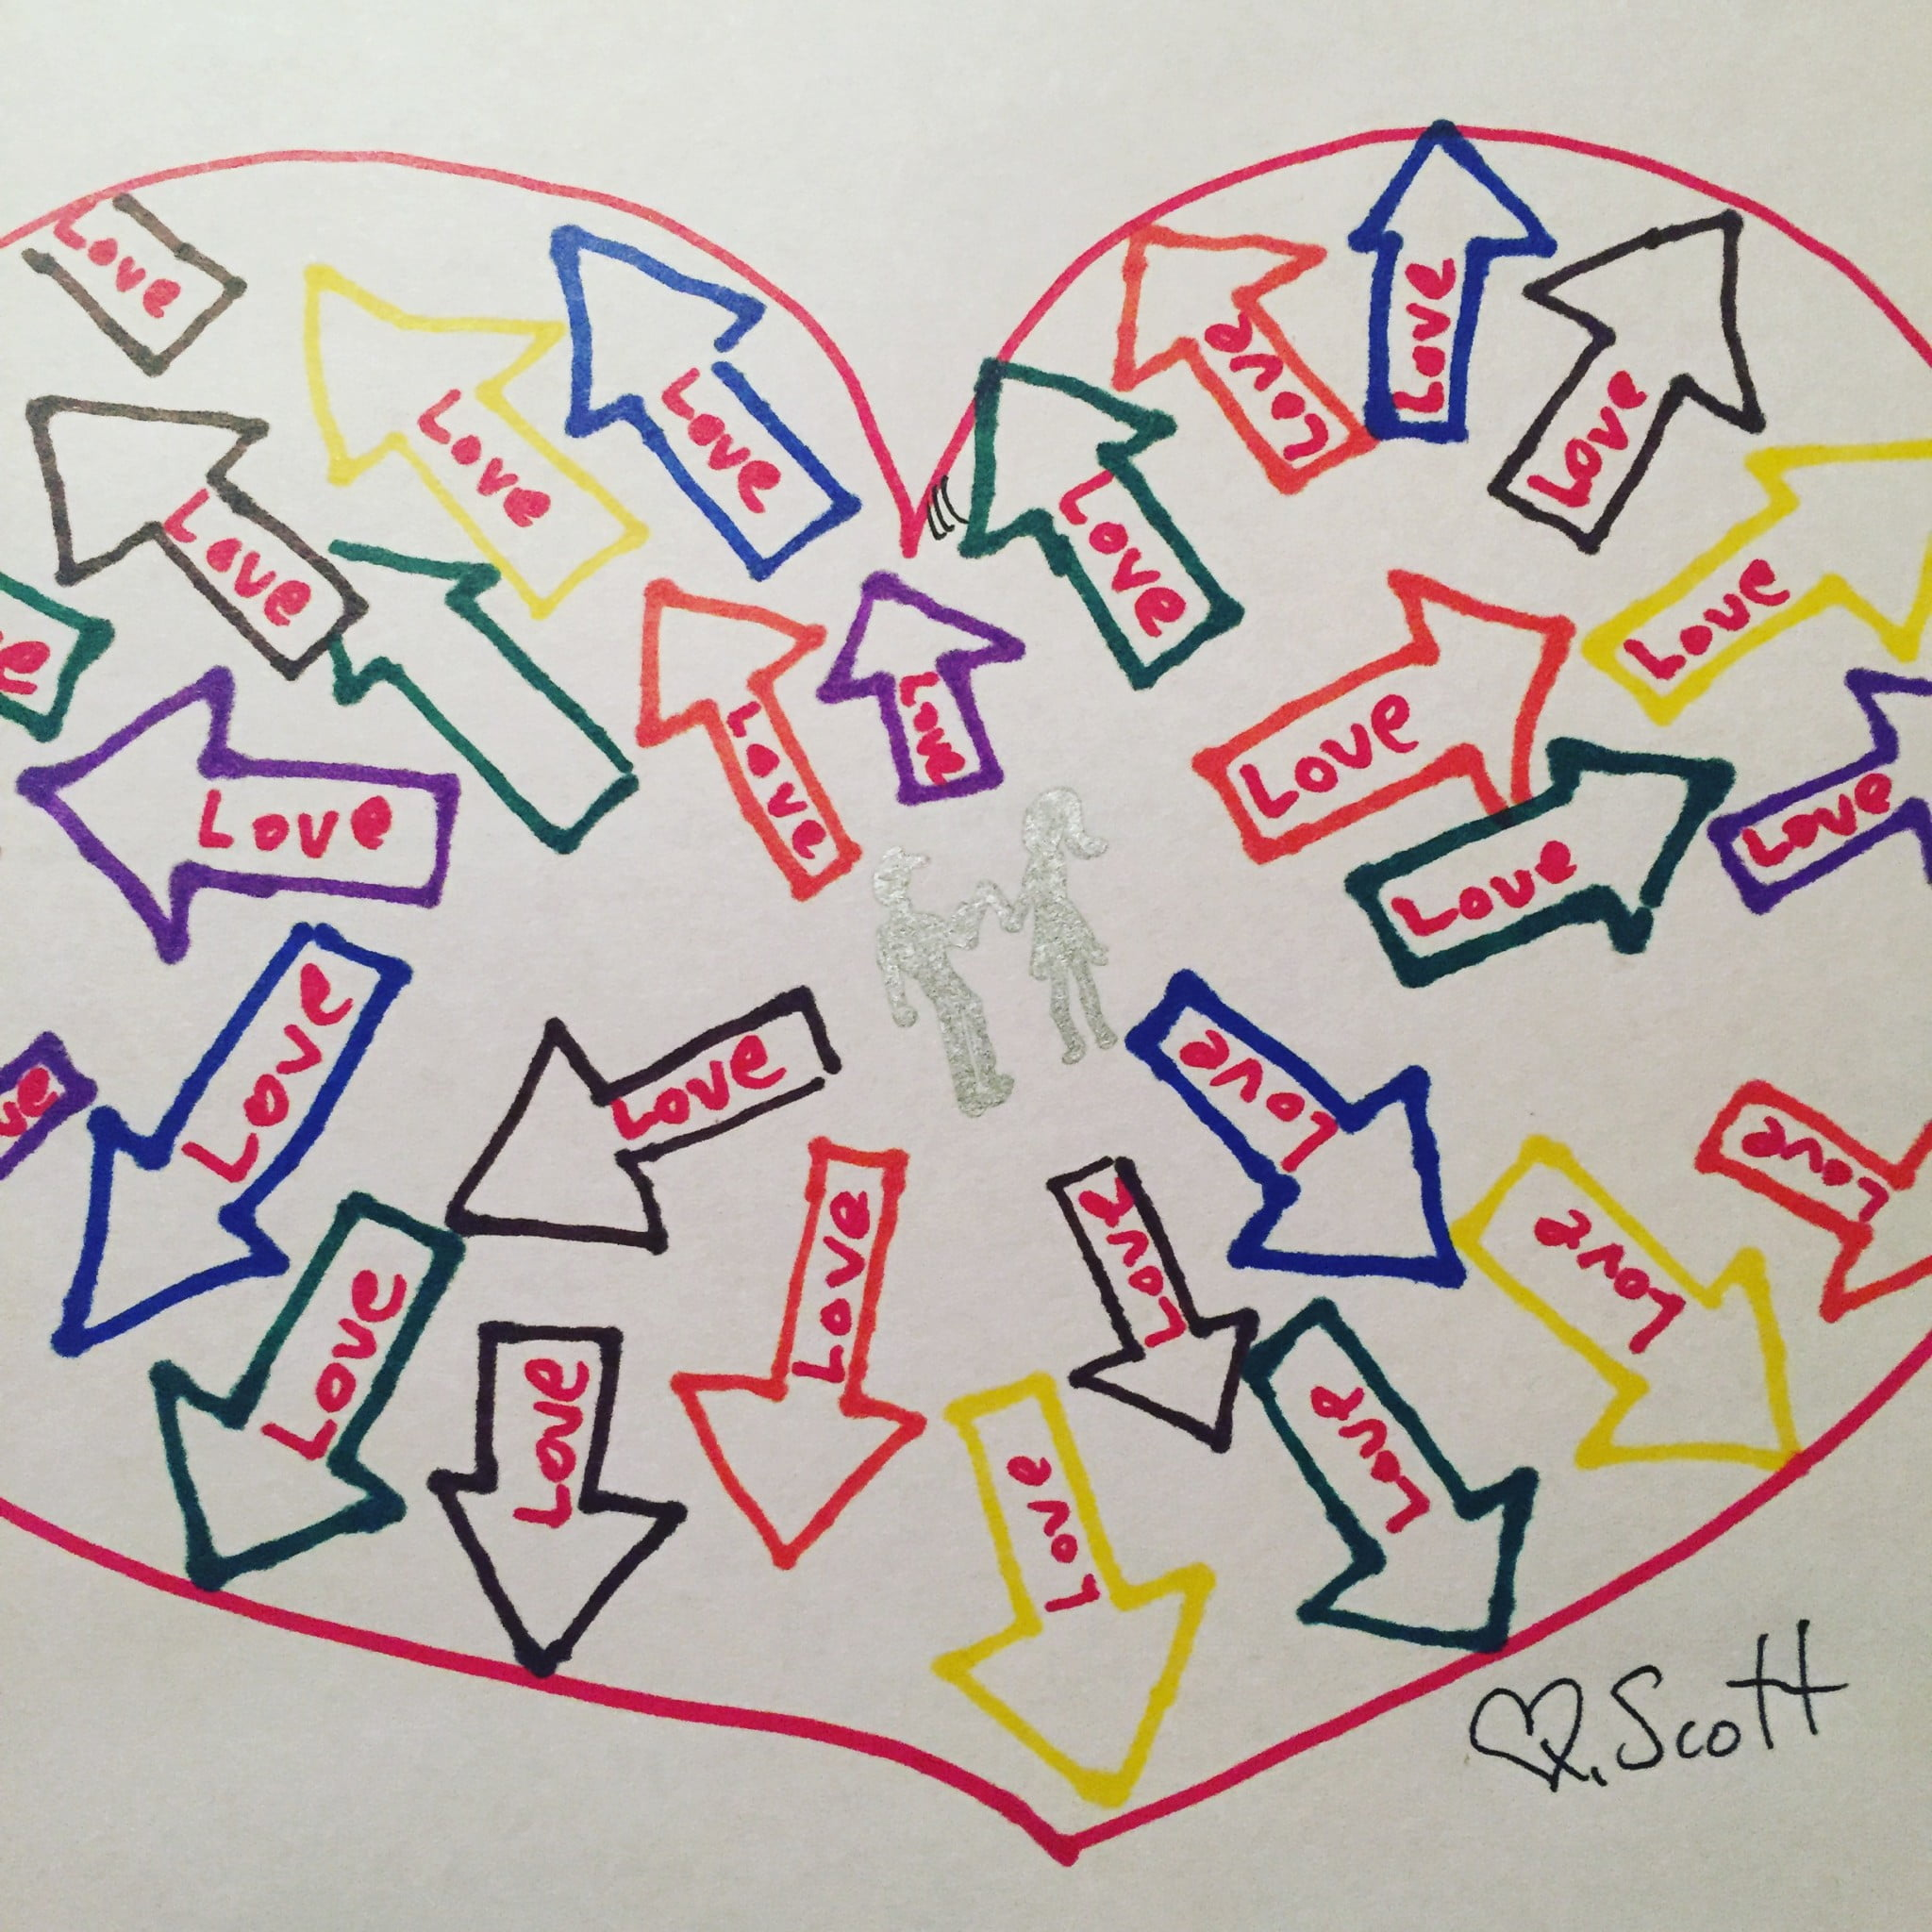 Love, draw, heart